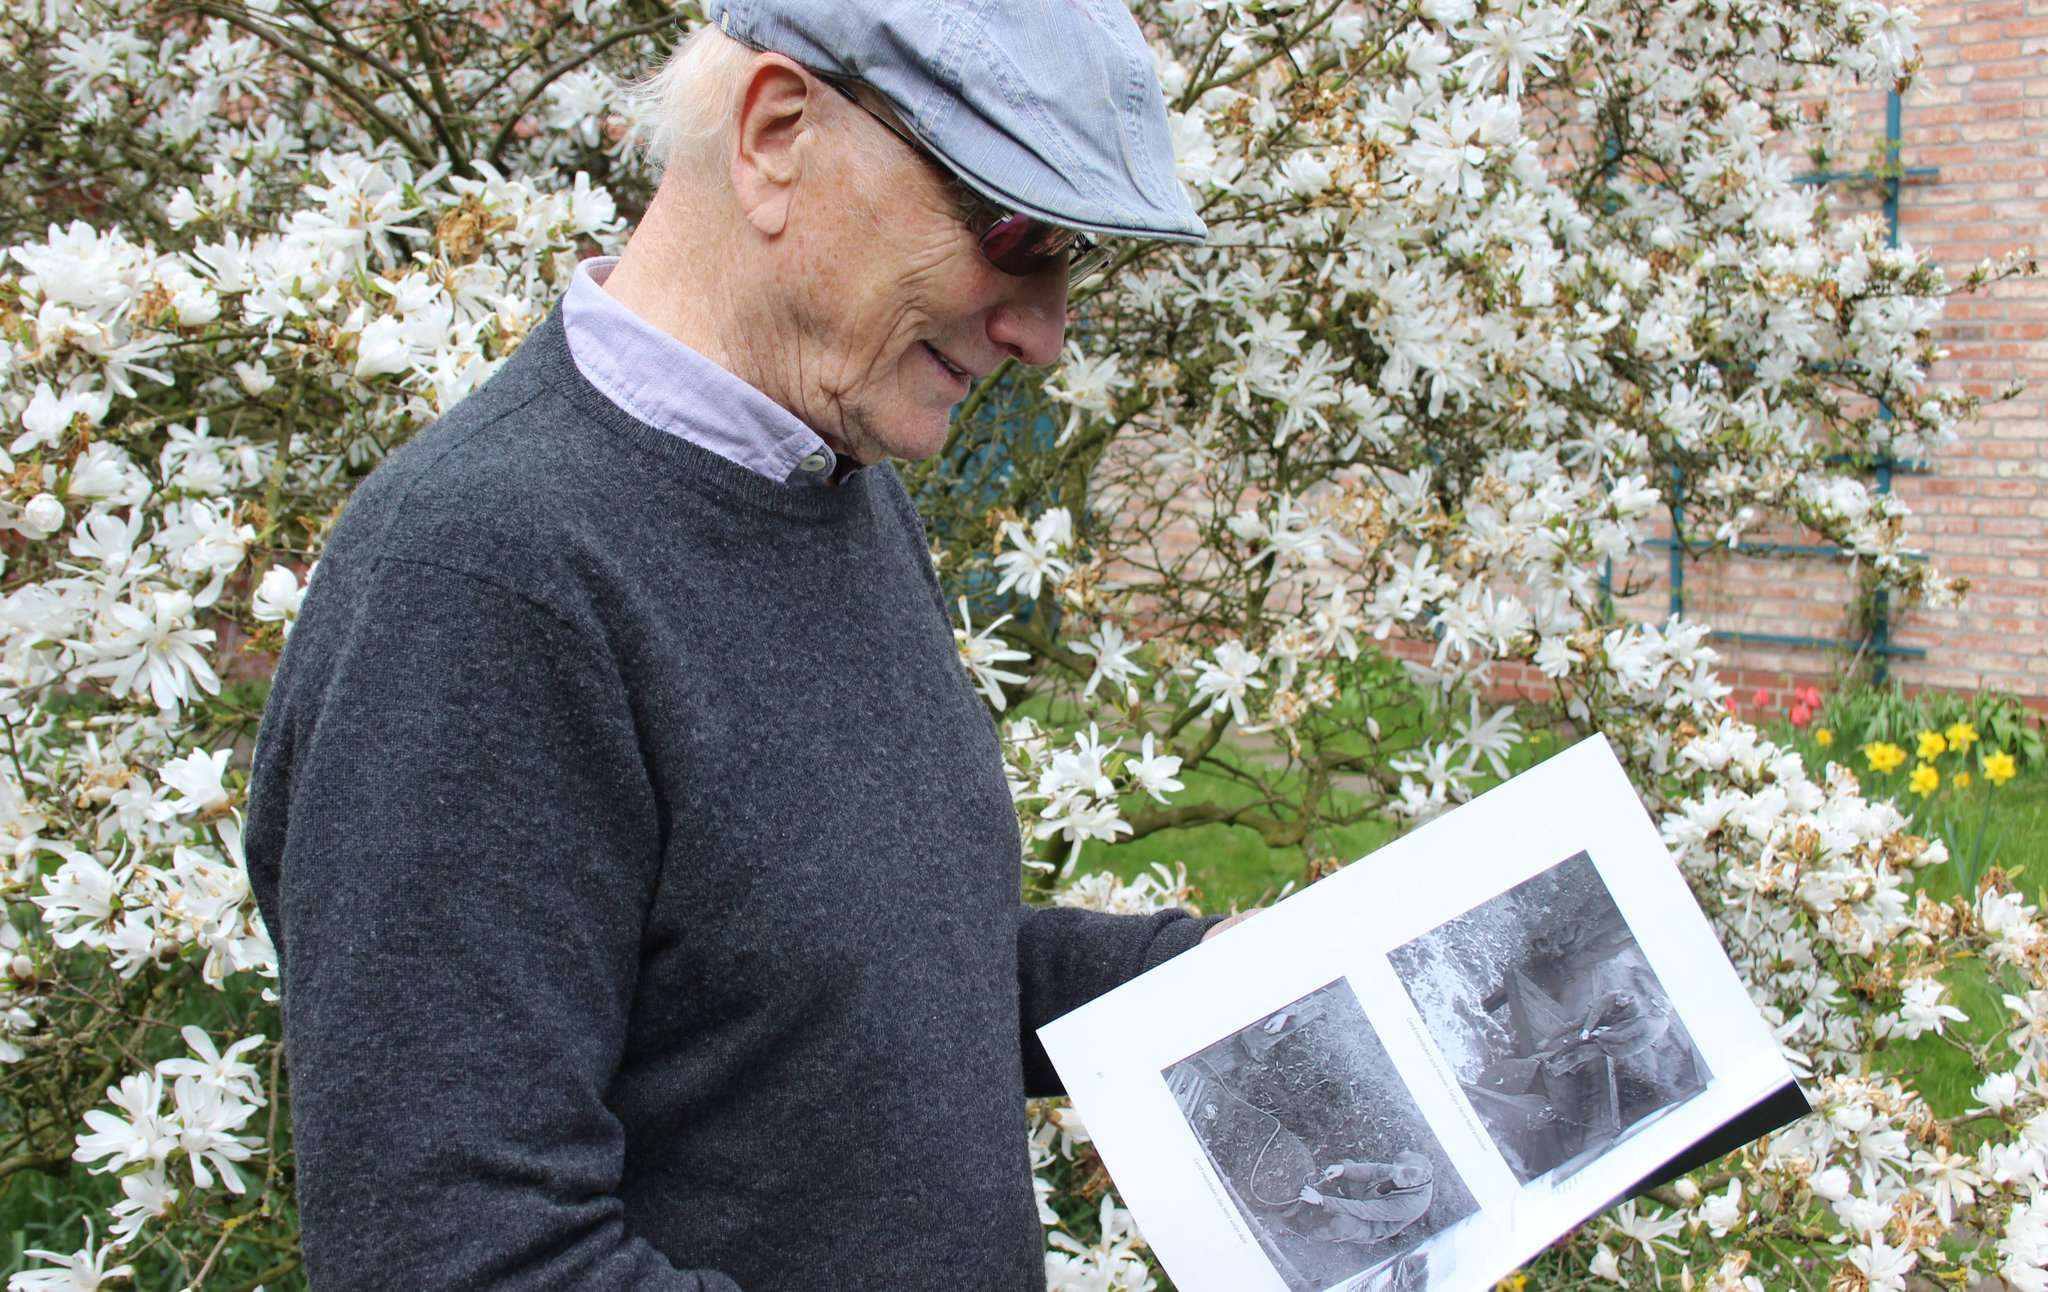 Jochen Bertzbach blättert in seinem neuen Buch über Wümme, Aalfang und Pooljagd. Foto: Björn Blaak